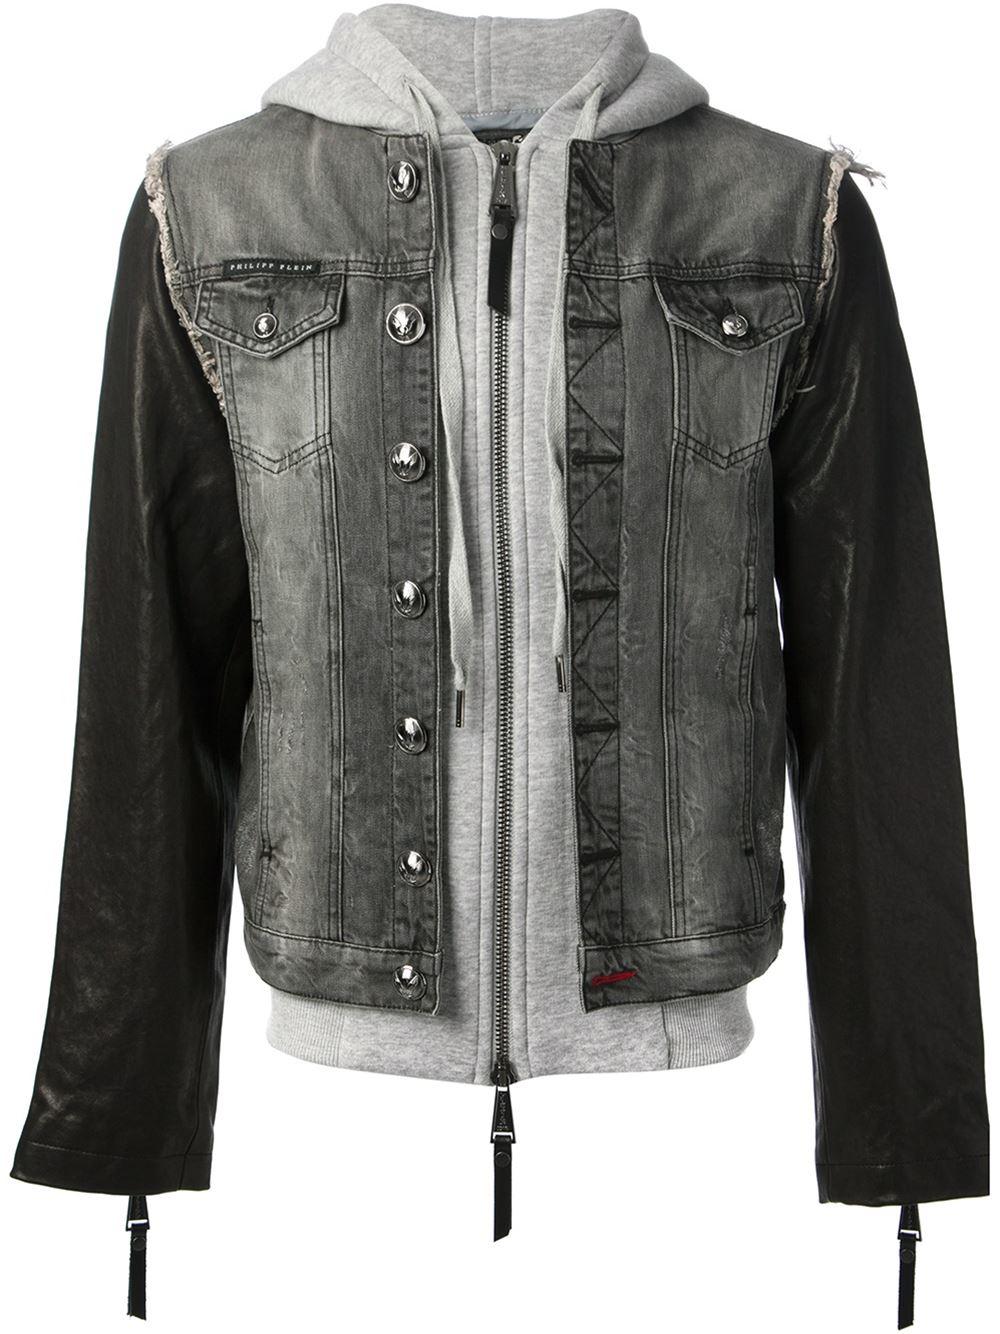 Philipp Plein Hooded Denim Jacket In Gray For Men Lyst